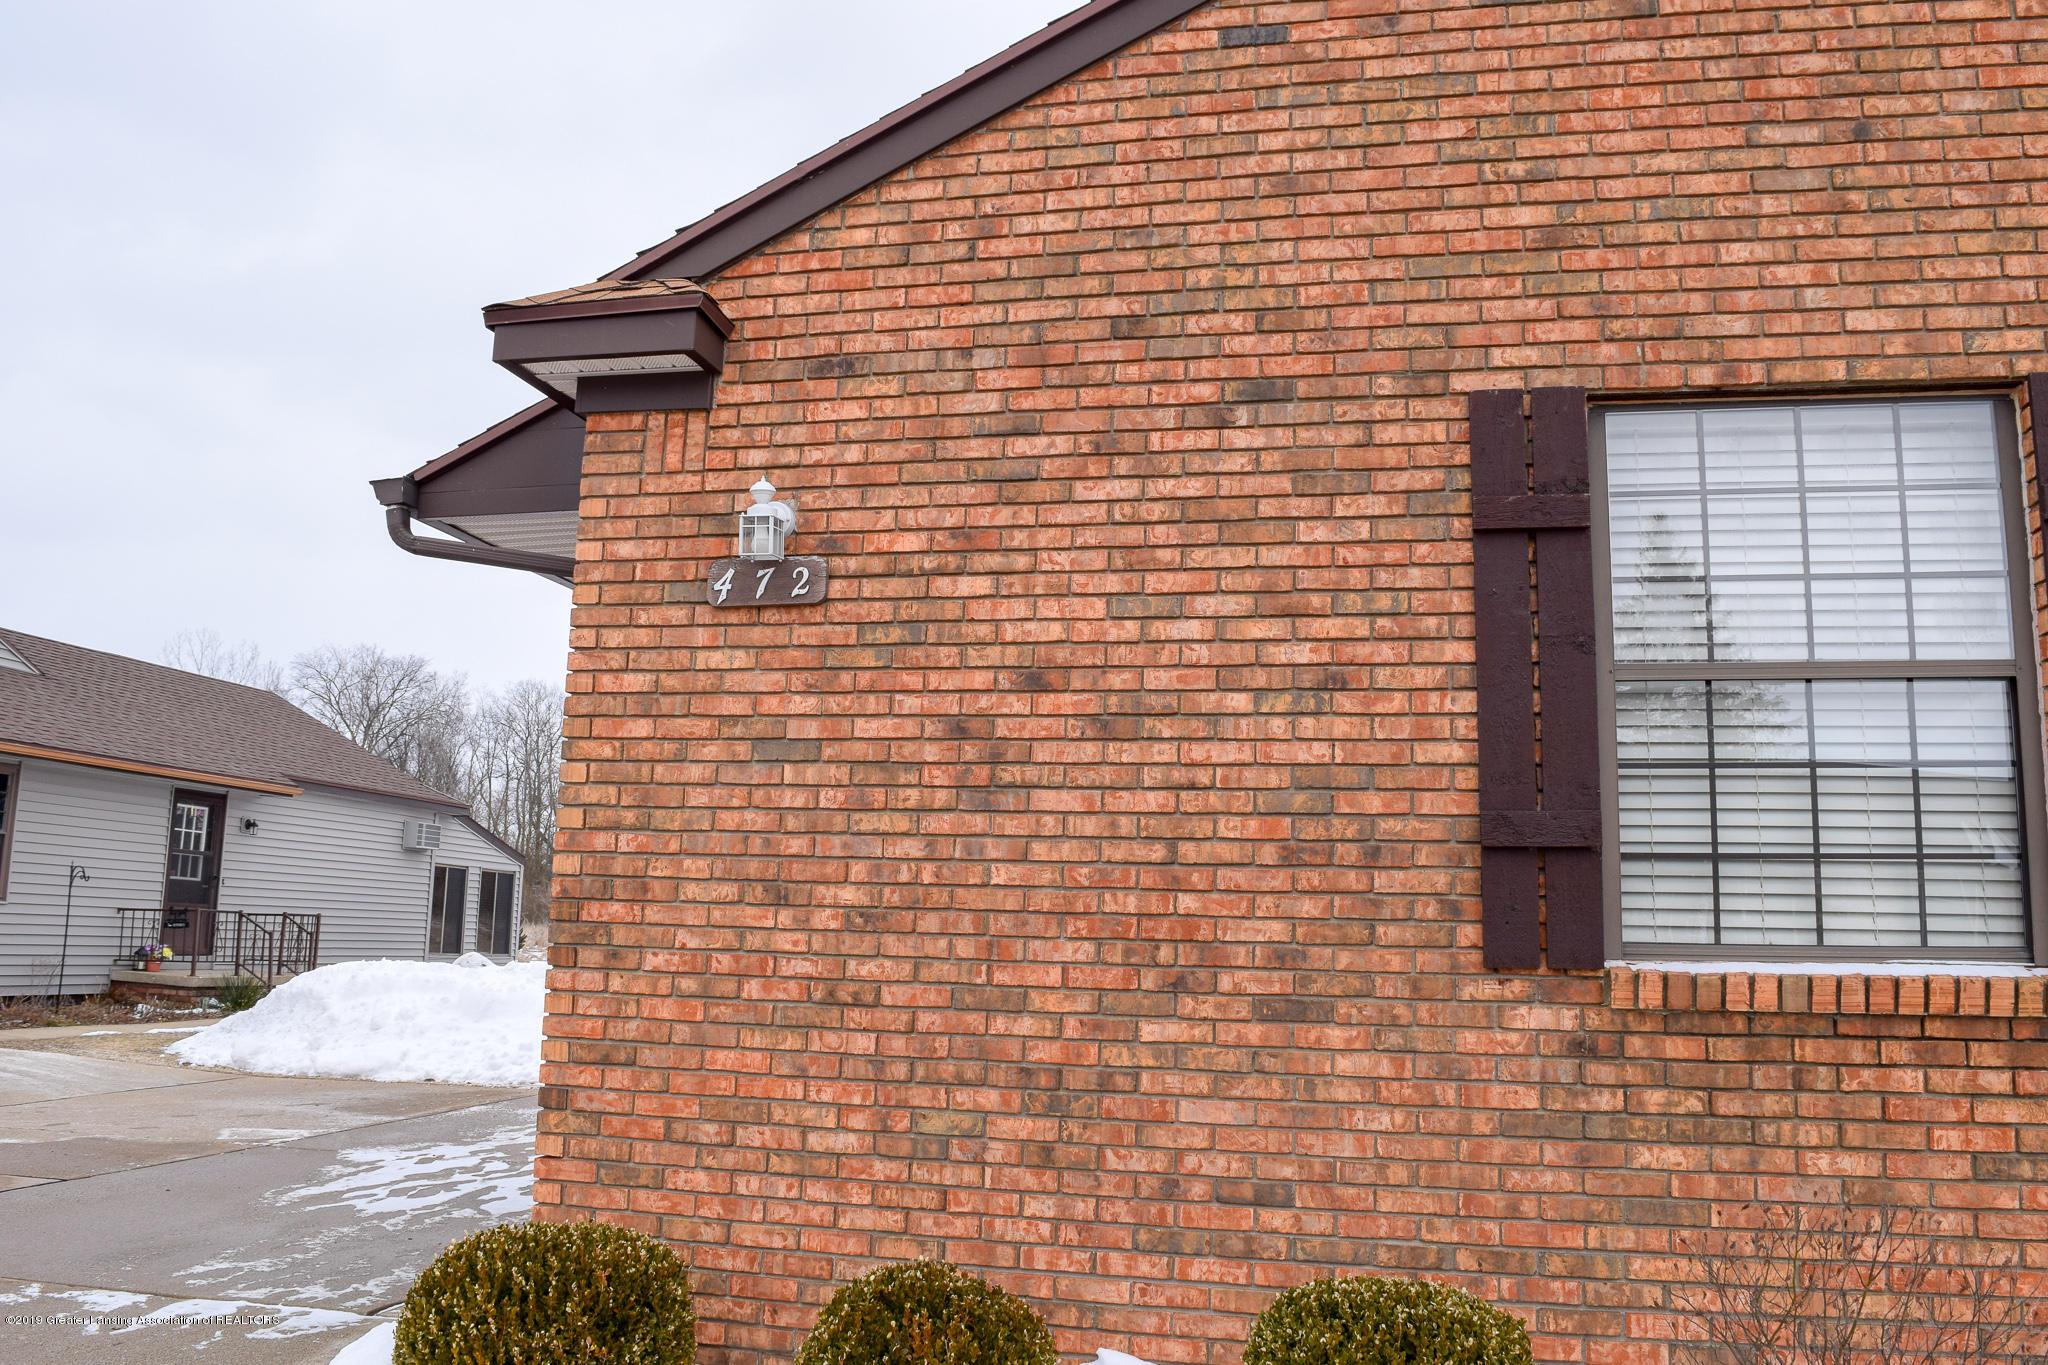 472 Red Cedar Blvd 1 - Ext. Front - 5